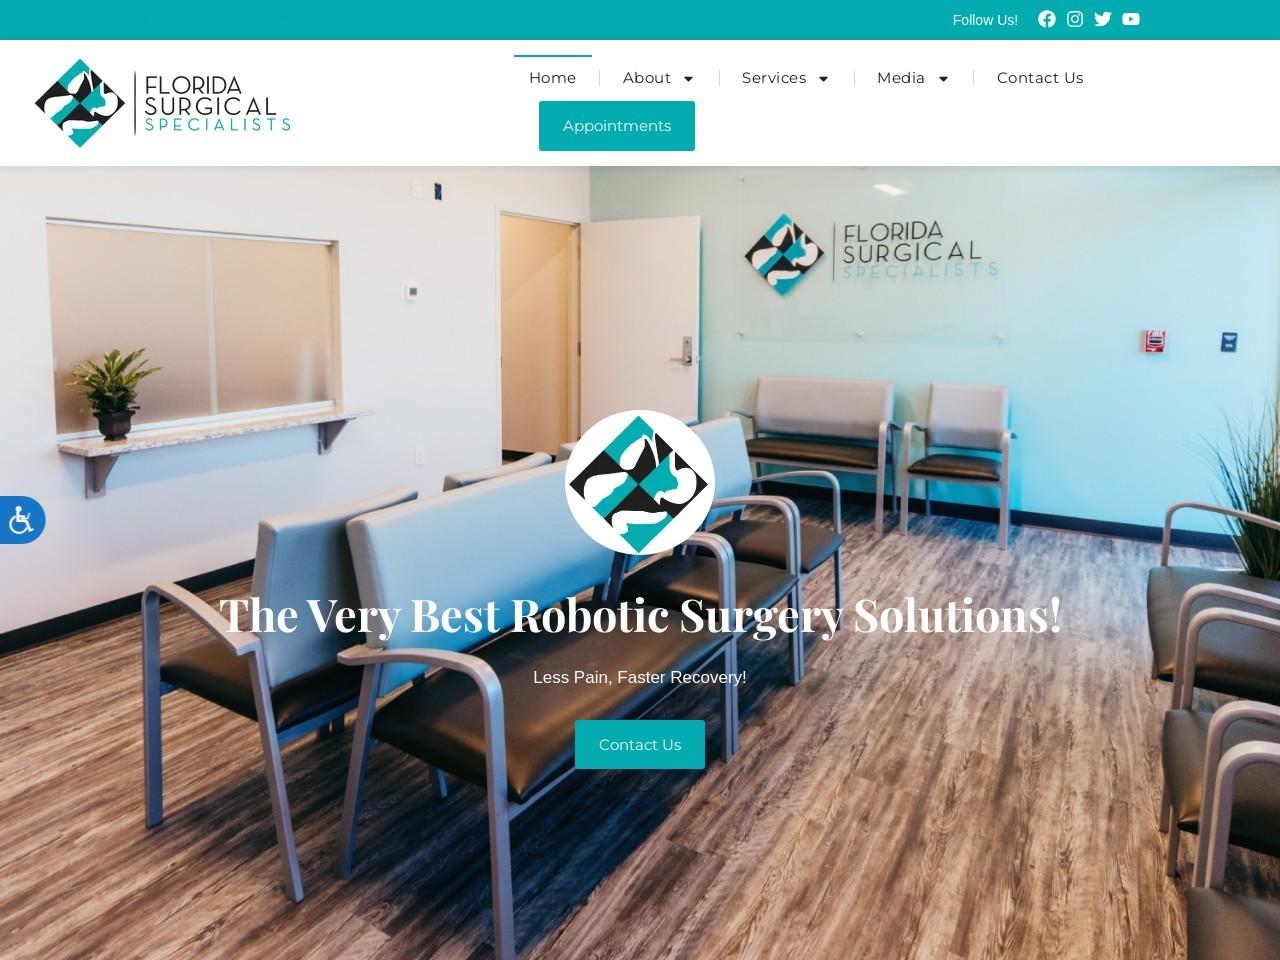 florida surgical specialists website screenshot